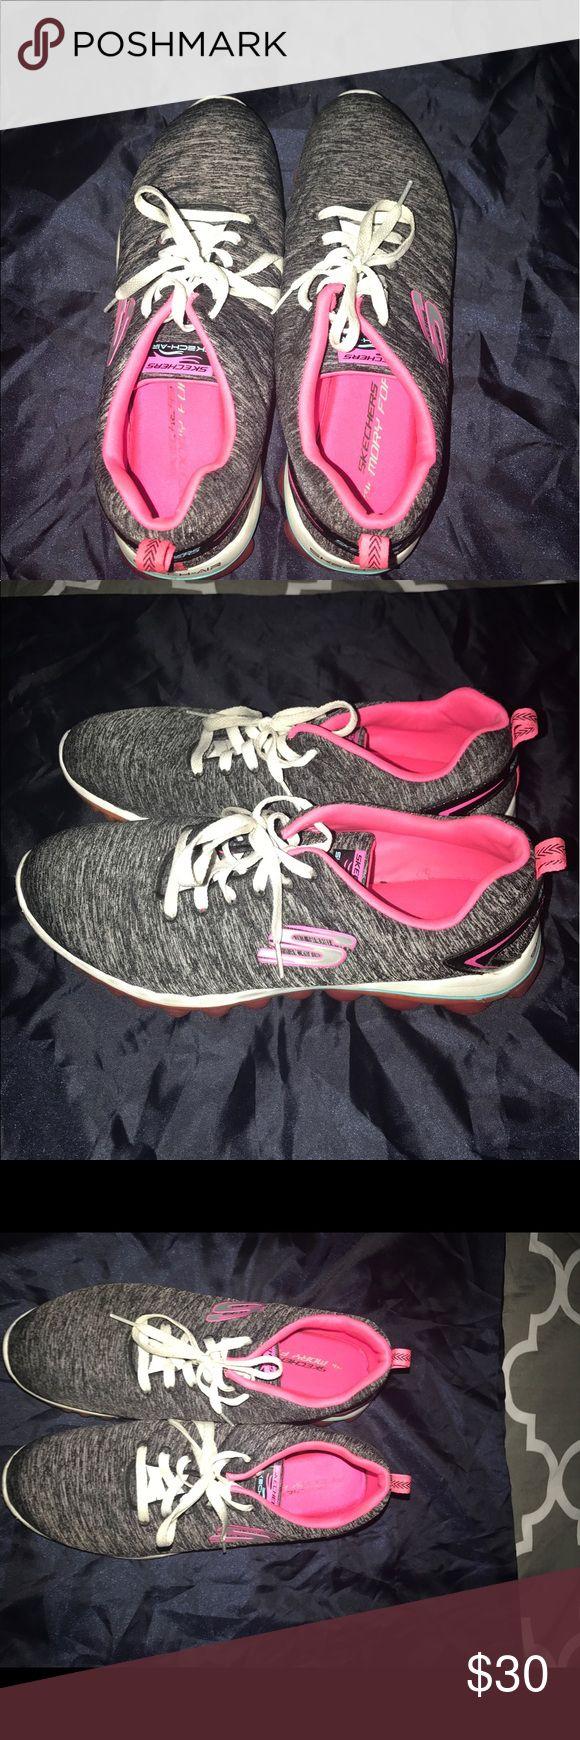 Skechers memory foam! Sale! Skechers memory foam sneakers! Skechers Shoes Sneakers